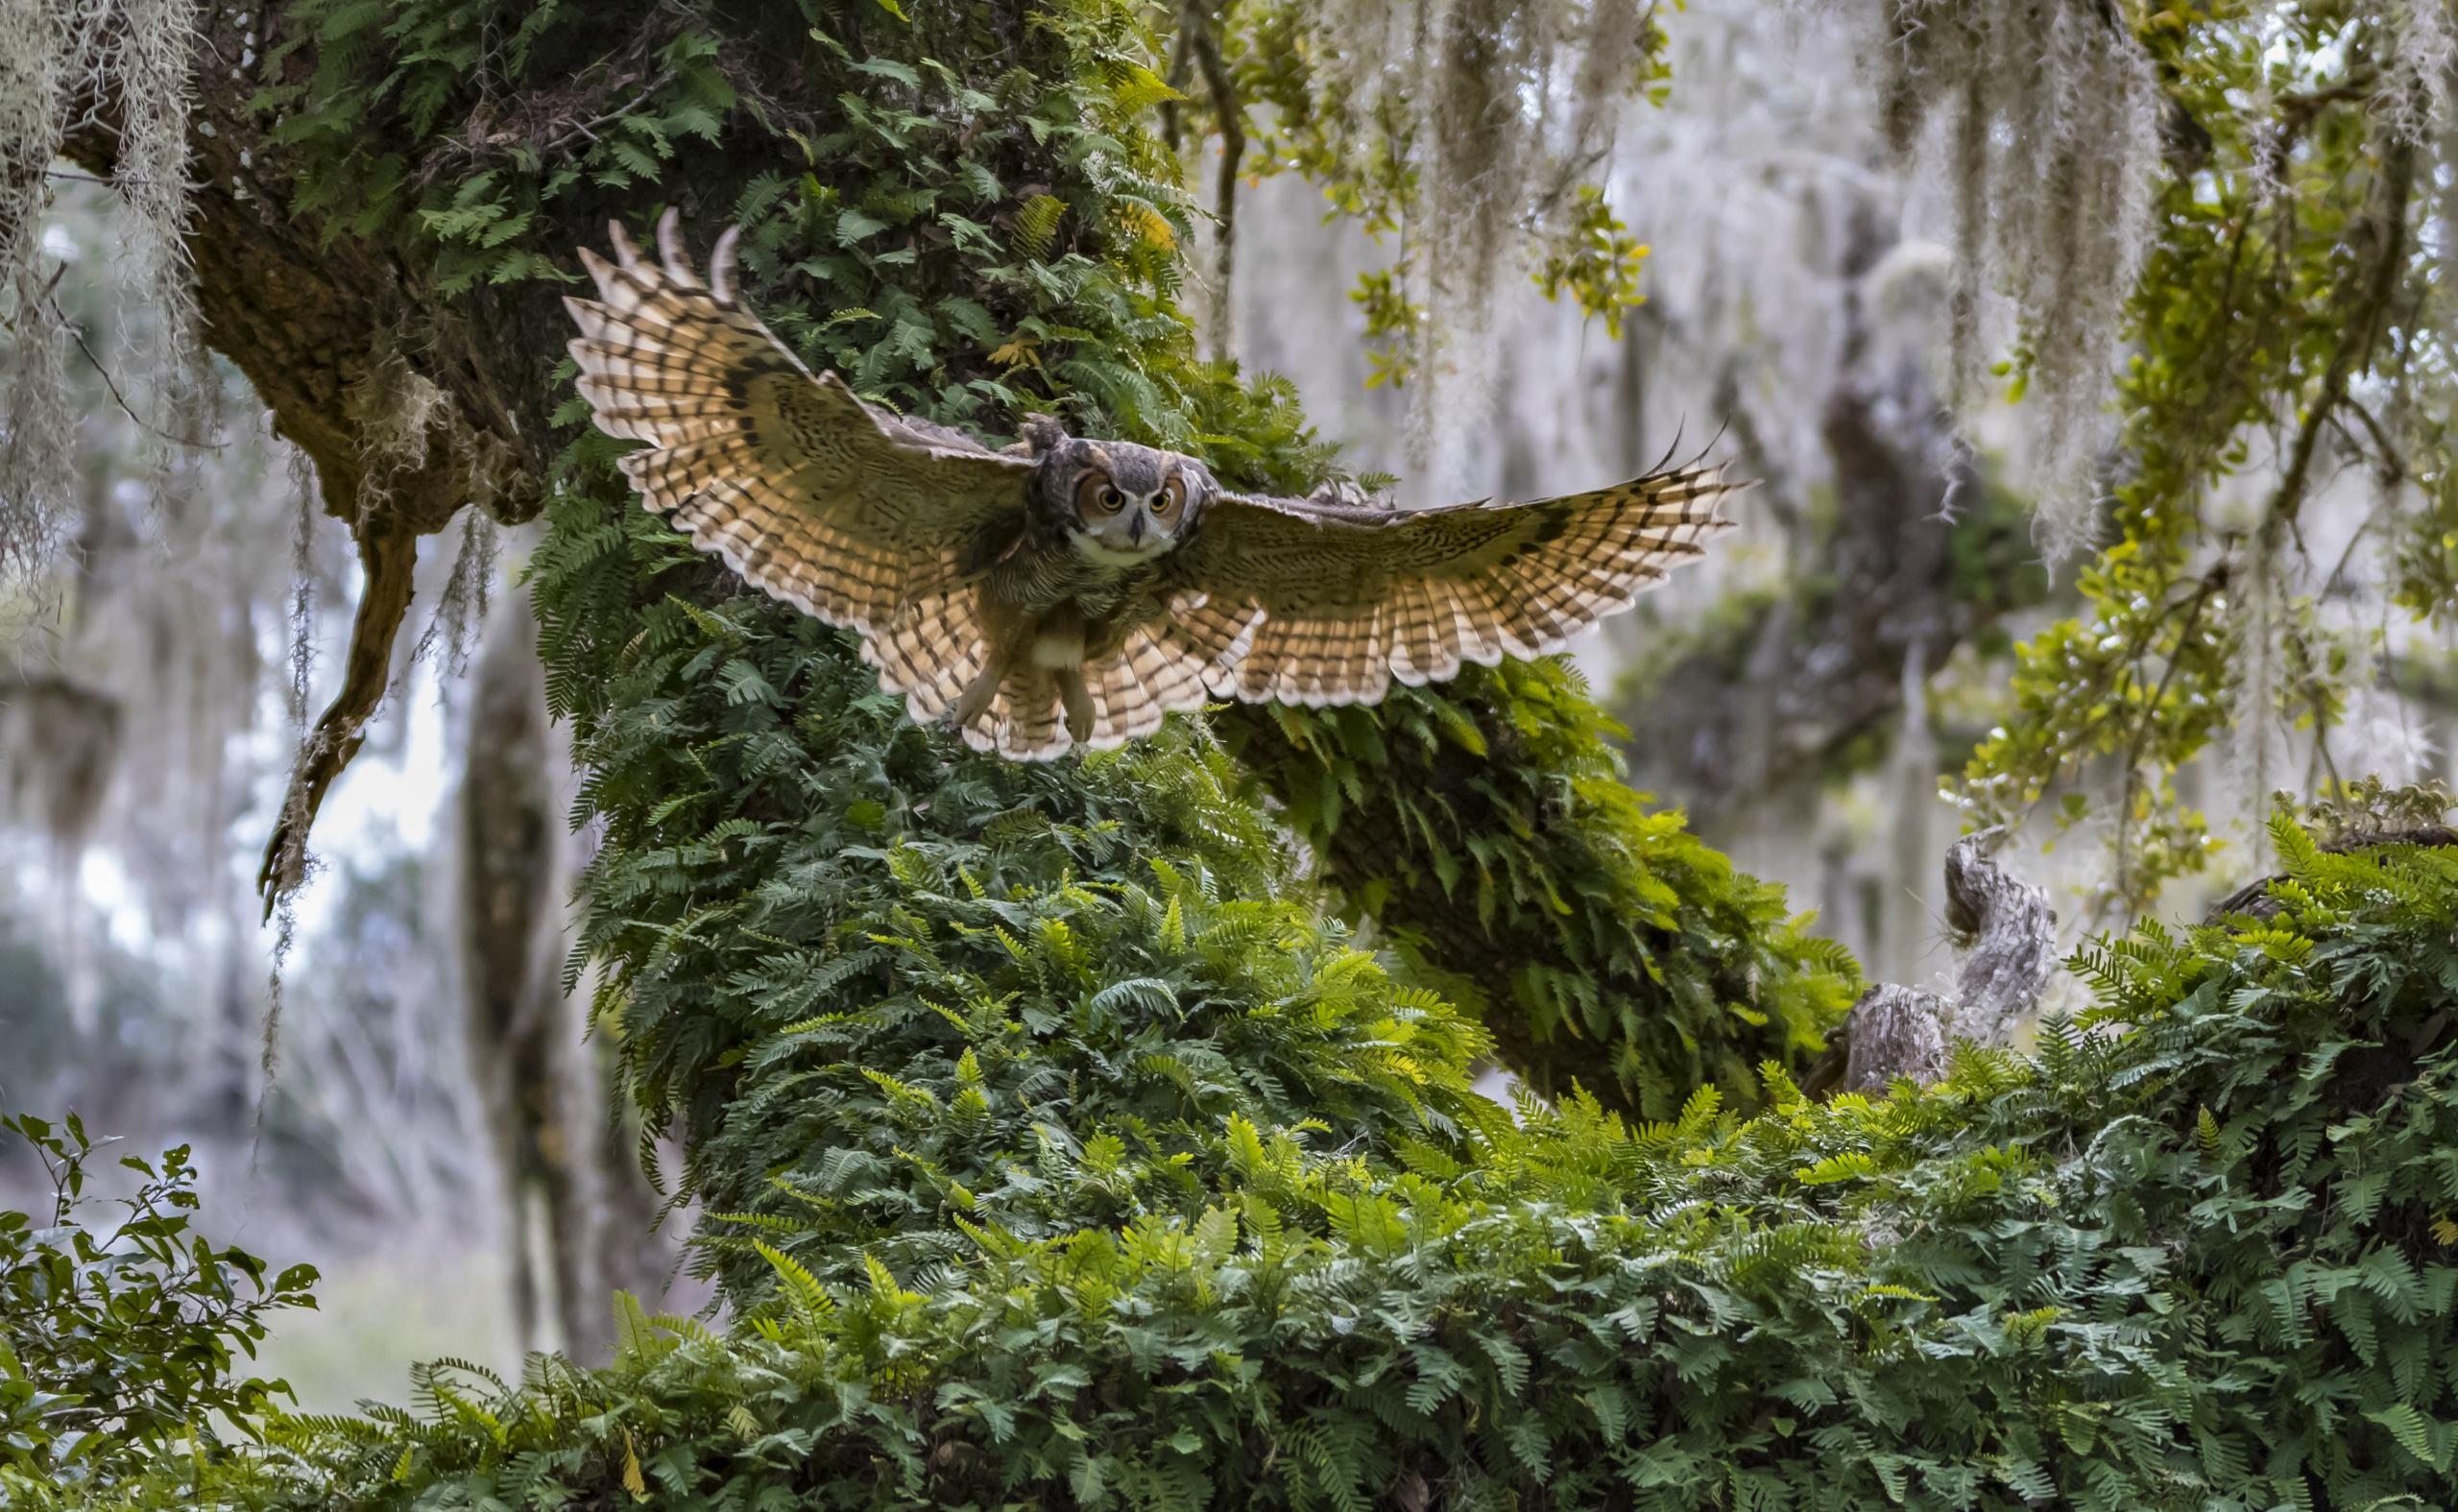 Great horned owl, Lecanto, Fla, 2015.